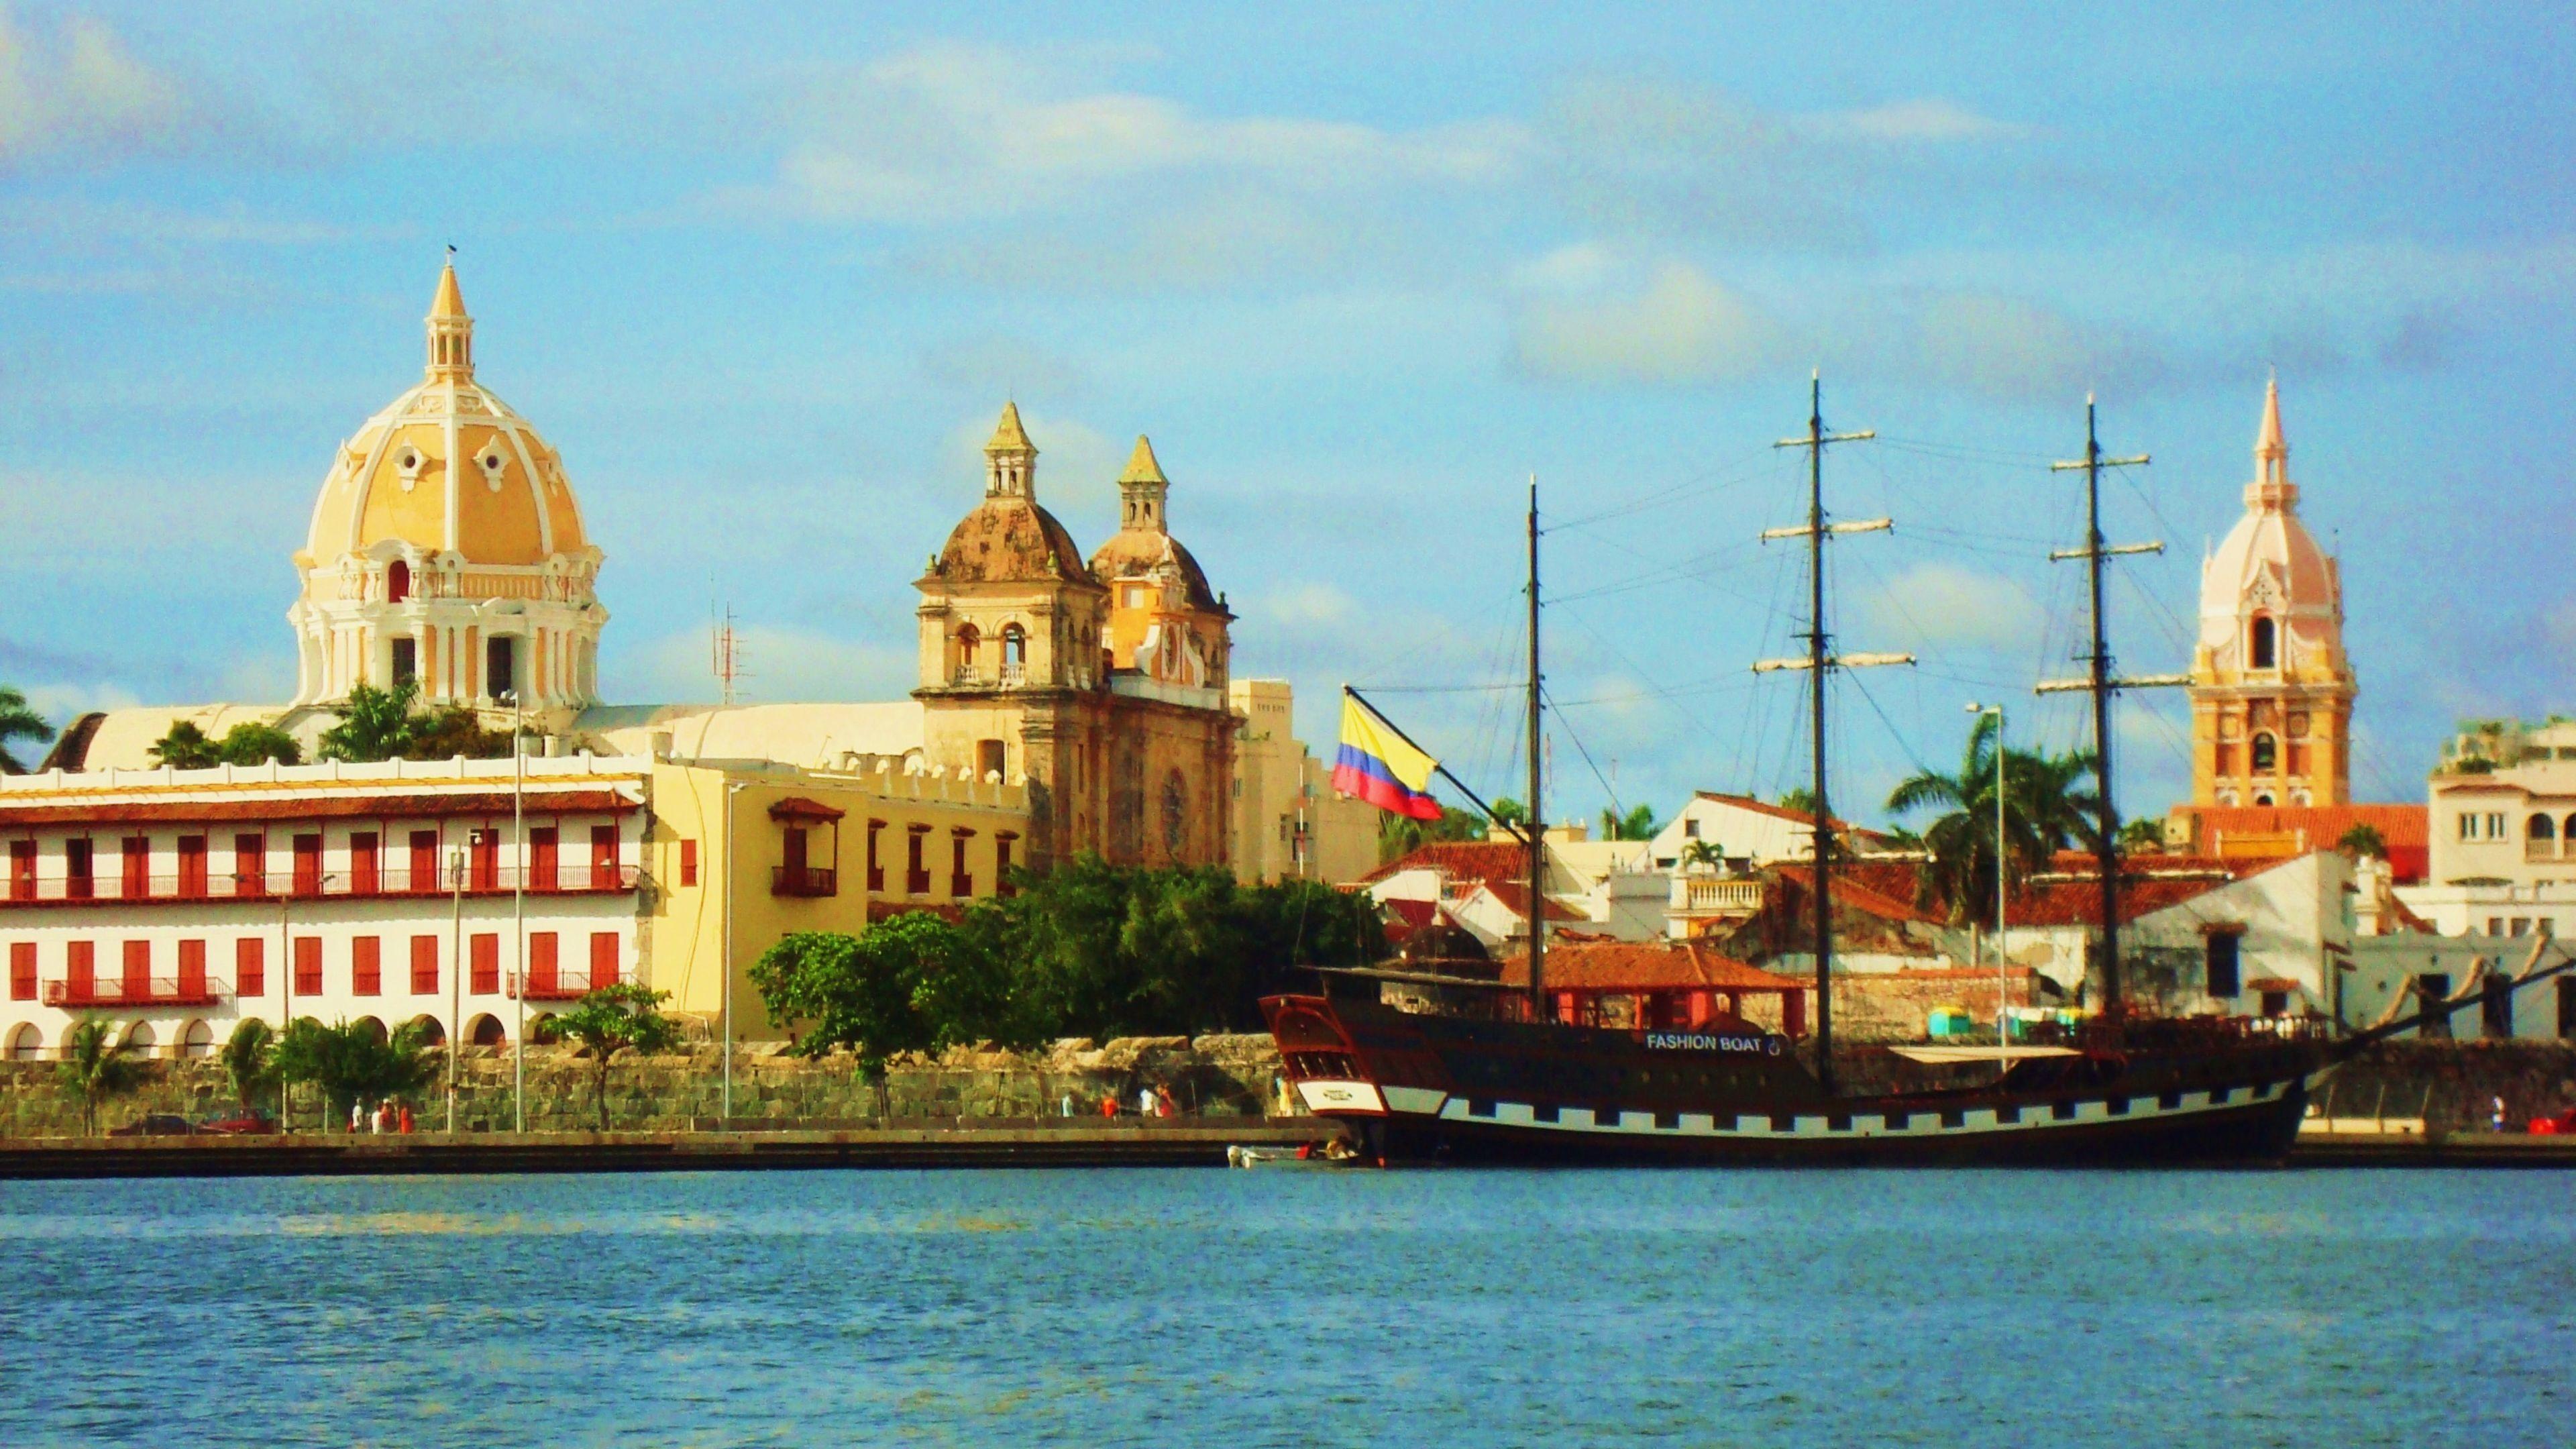 Res: 3840x2160, Download Cartagena Colombia 4K Wallpaper 4K